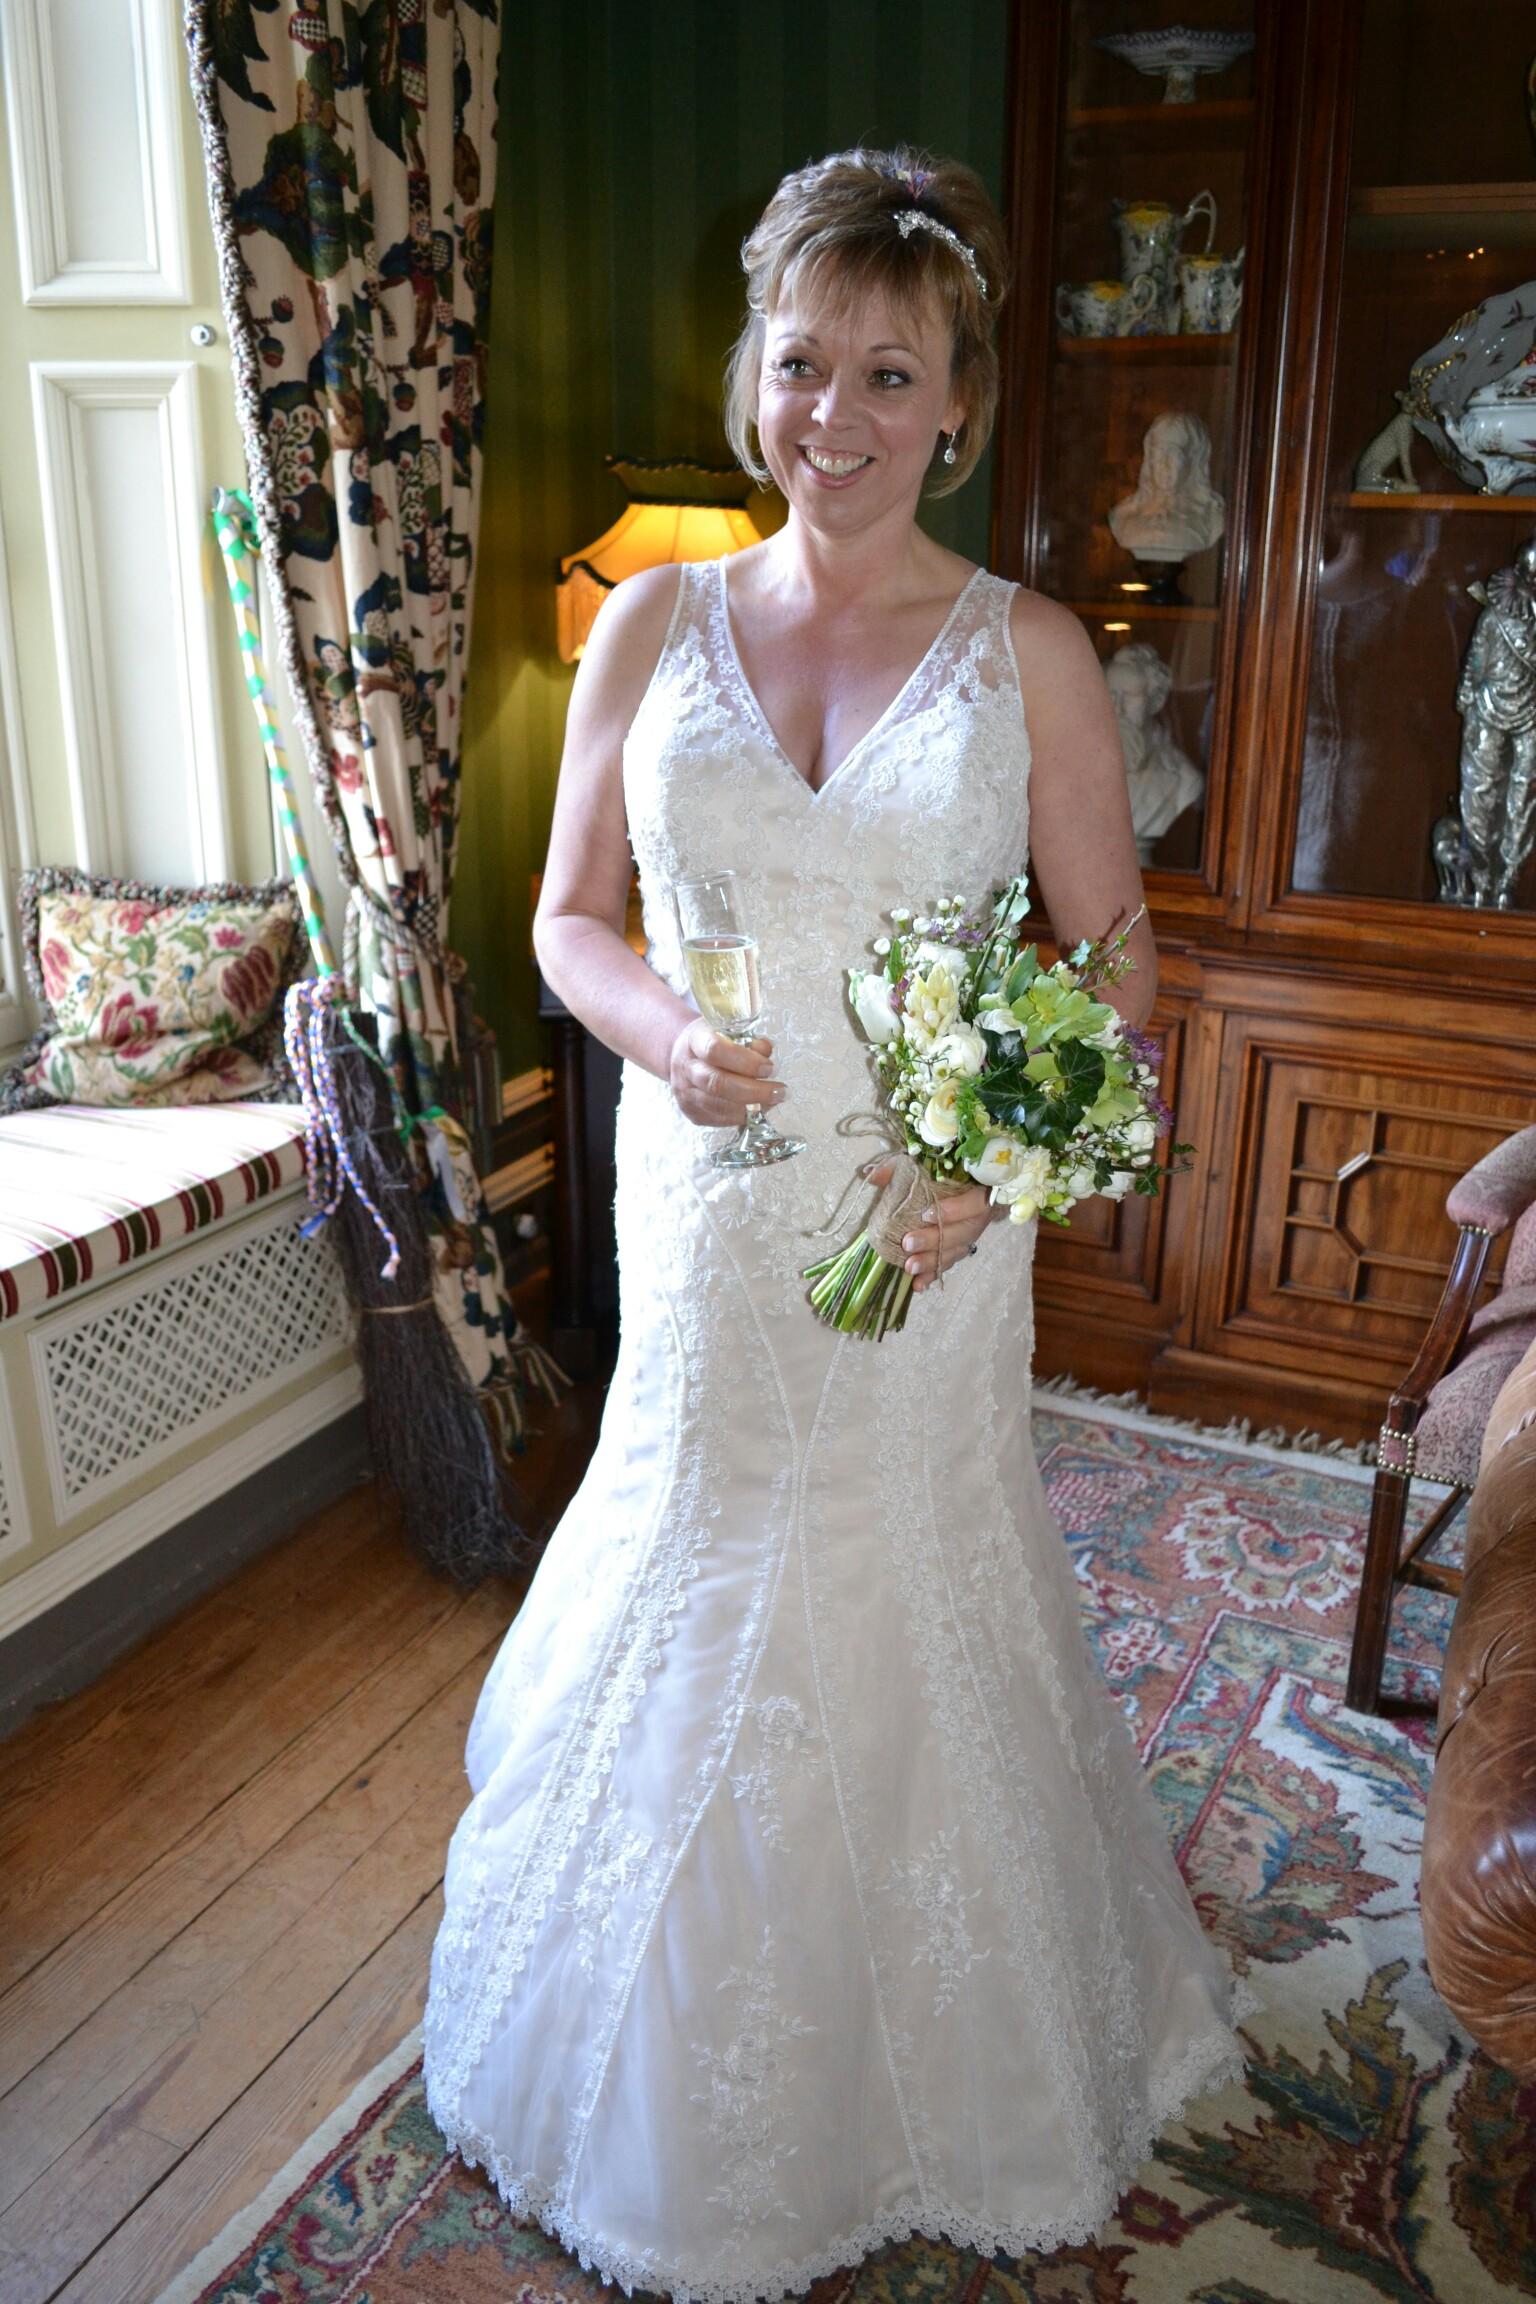 Colorful Wedding Dress Shops Walsall Mold - Wedding Plan Ideas ...